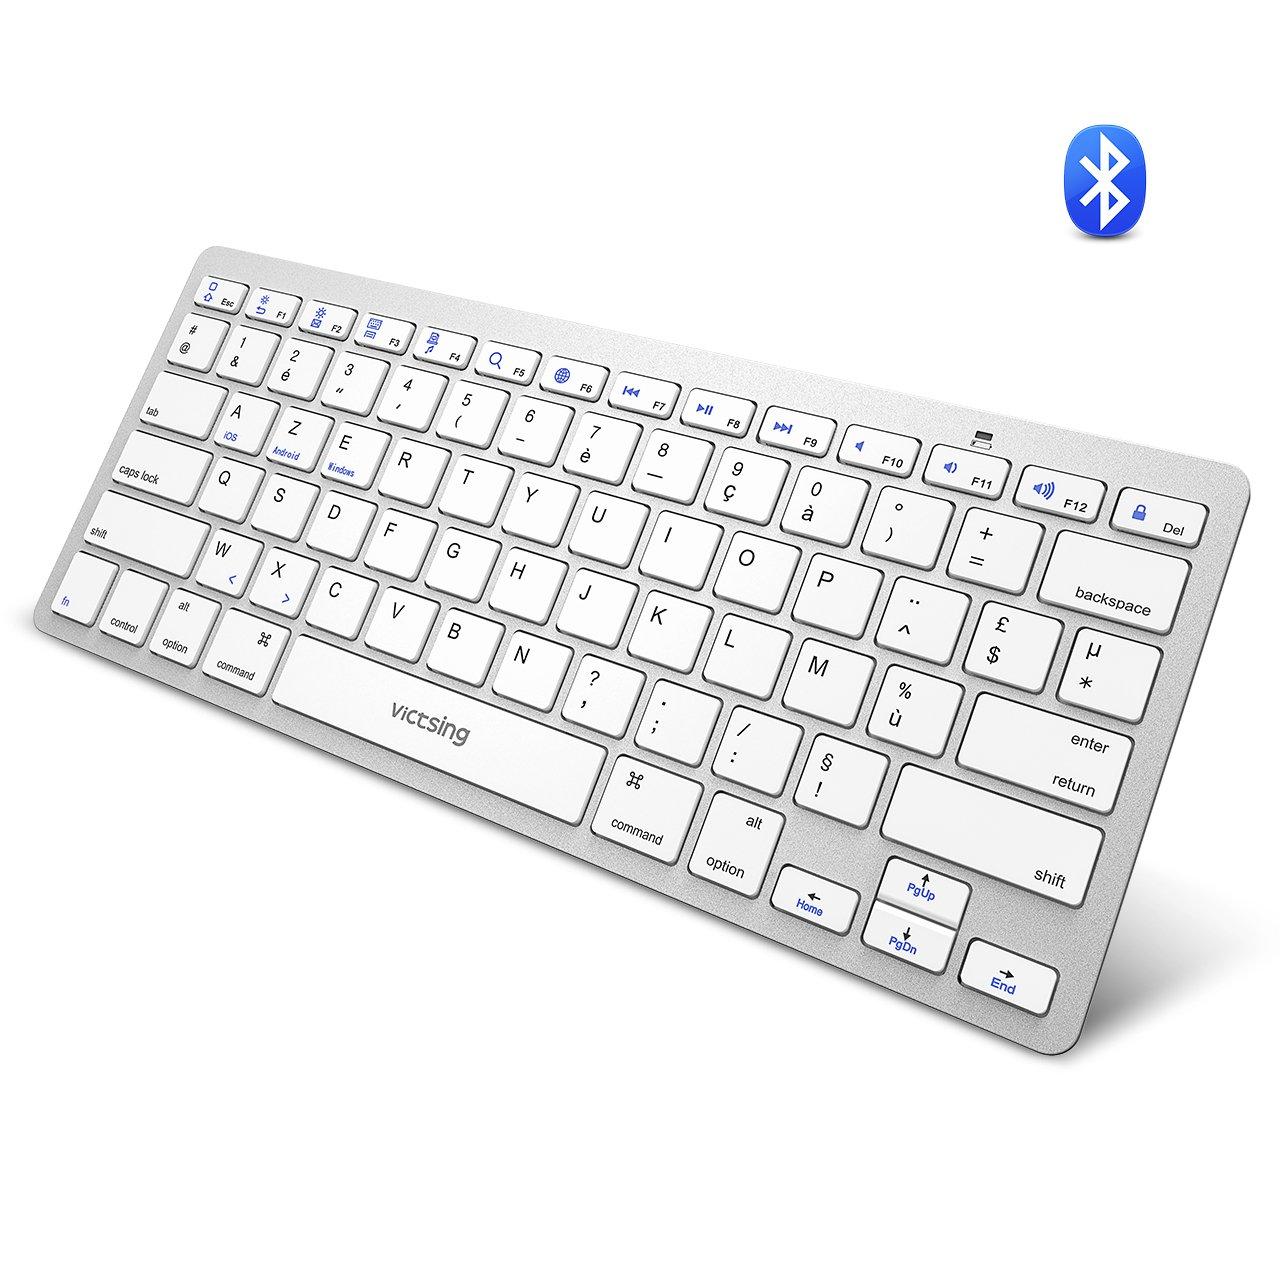 VicTsing Ultra-Slim Portable Bluetooth Keyboard, Wireless Keyboard for iOS  (iPhone, iPad), Android, Windows, Mac Computer, Laptop, Tablet, Smartphone